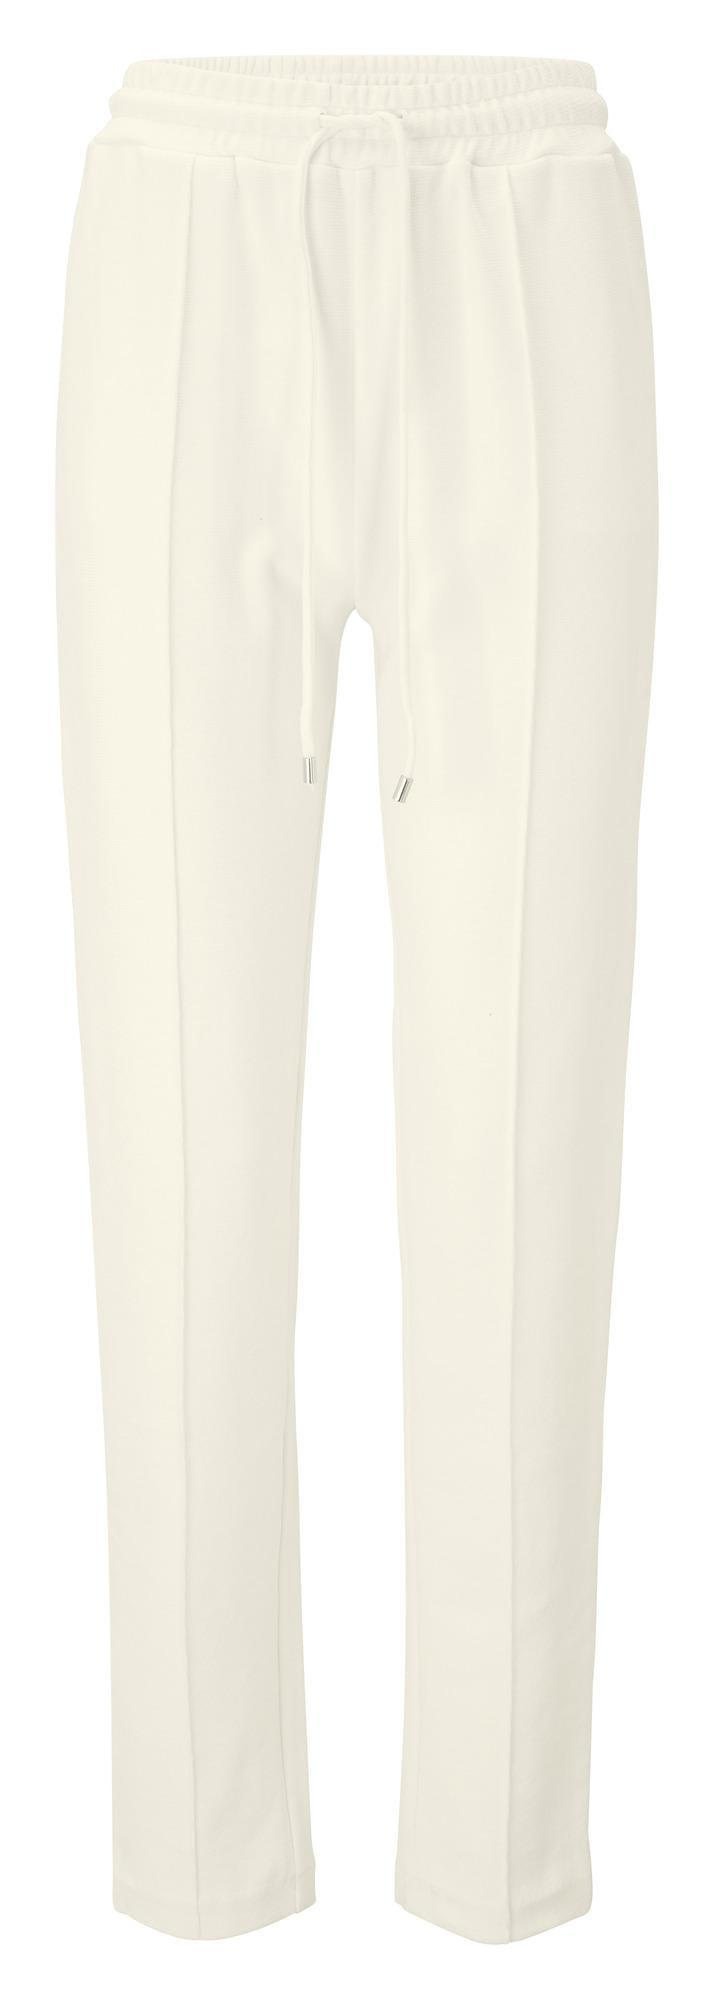 heine Pantaloncini da pigiama Beige